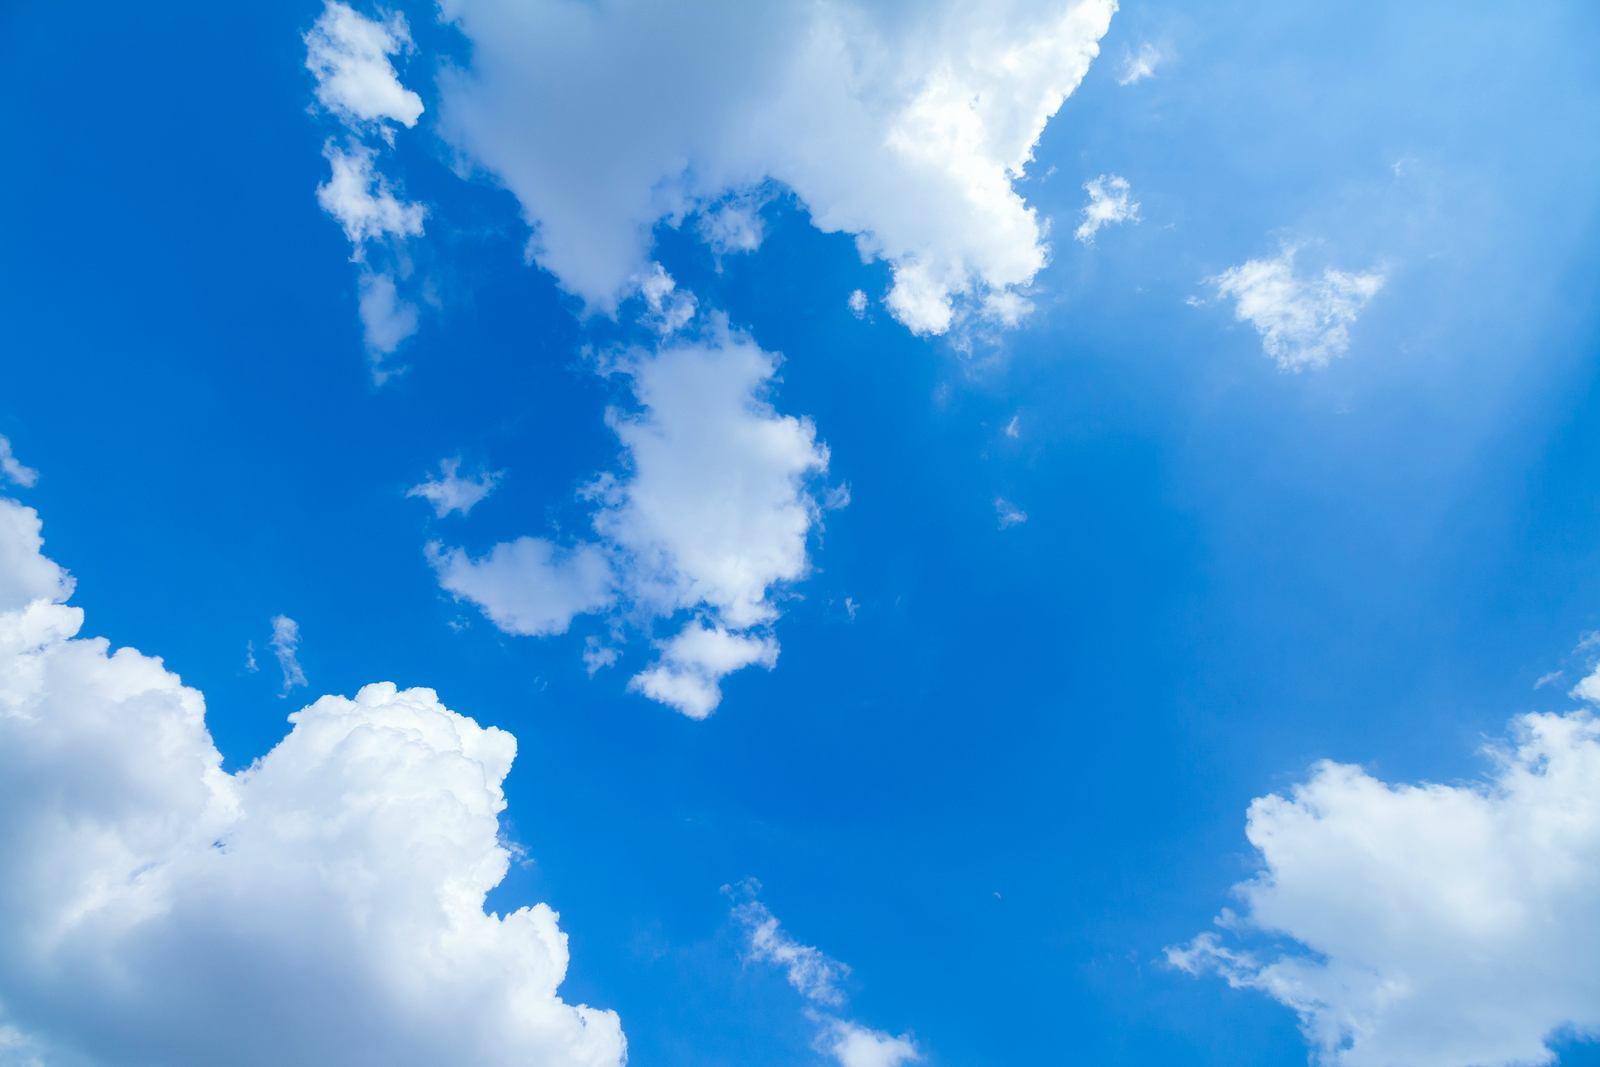 5 Hidden Spiritual Meanings Behind Clouds